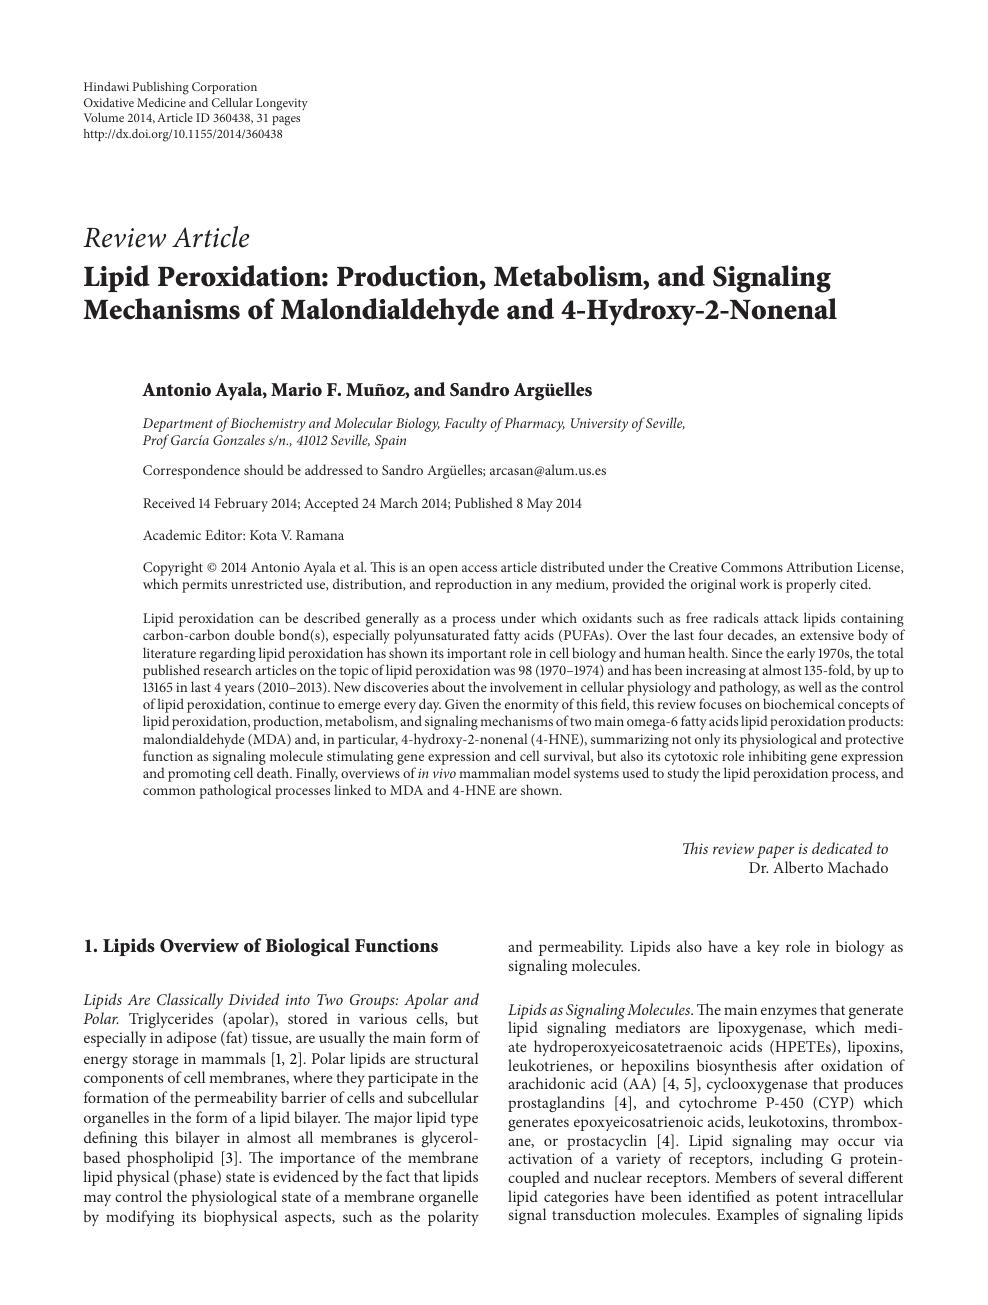 Lipid Peroxidation: Production, Metabolism, and Signaling